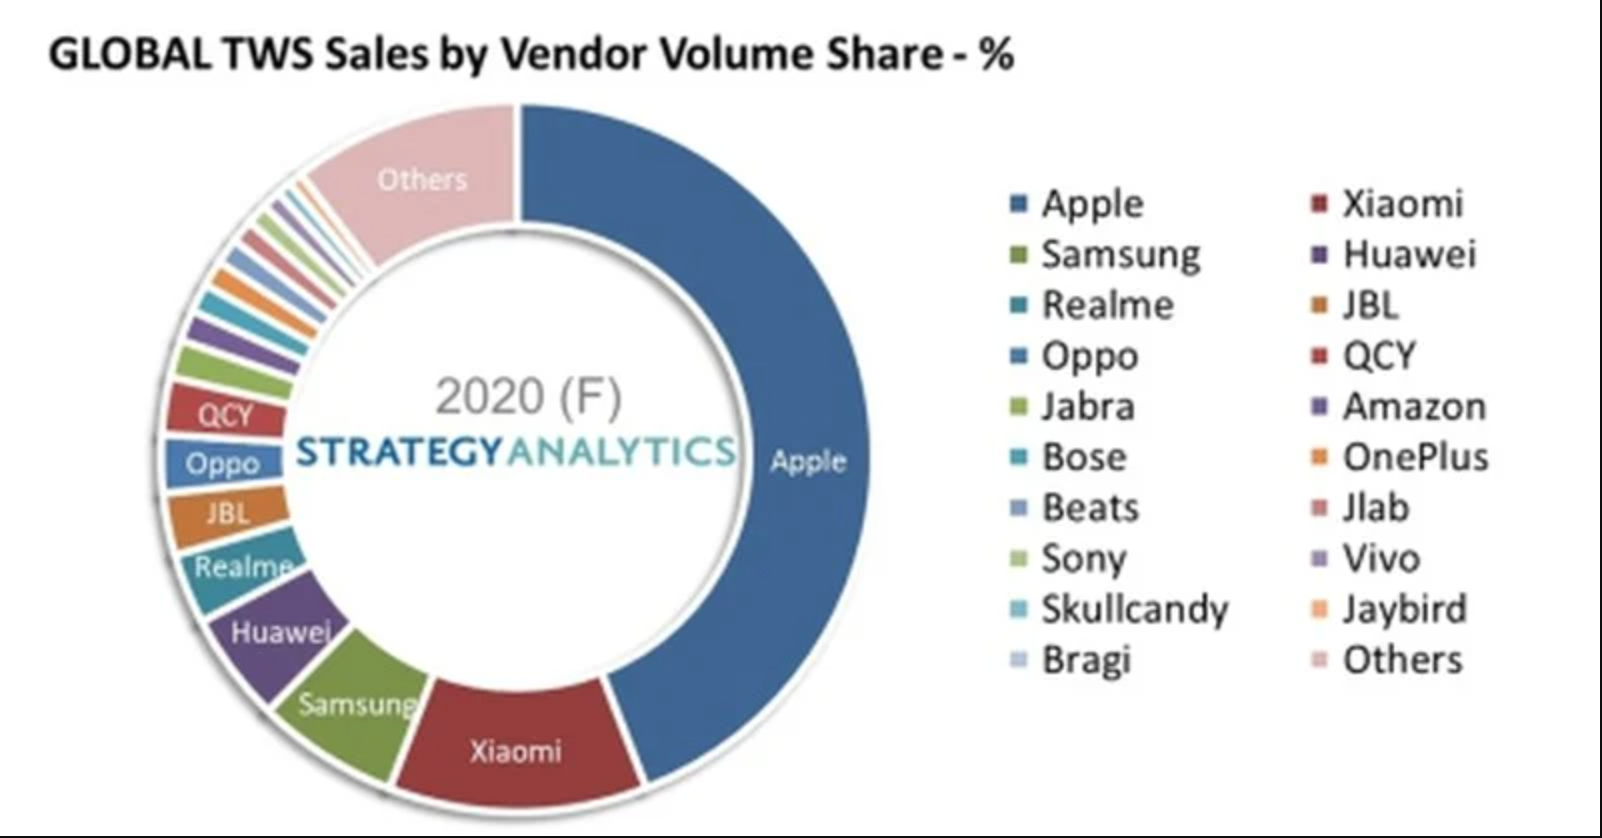 Screen Shot 1399 11 11 at 17.01.03 بازار هدفونهای بلوتوث با تسلط اپل ۹۰ درصد در سال ۲۰۲۰ رشد کرد اخبار IT